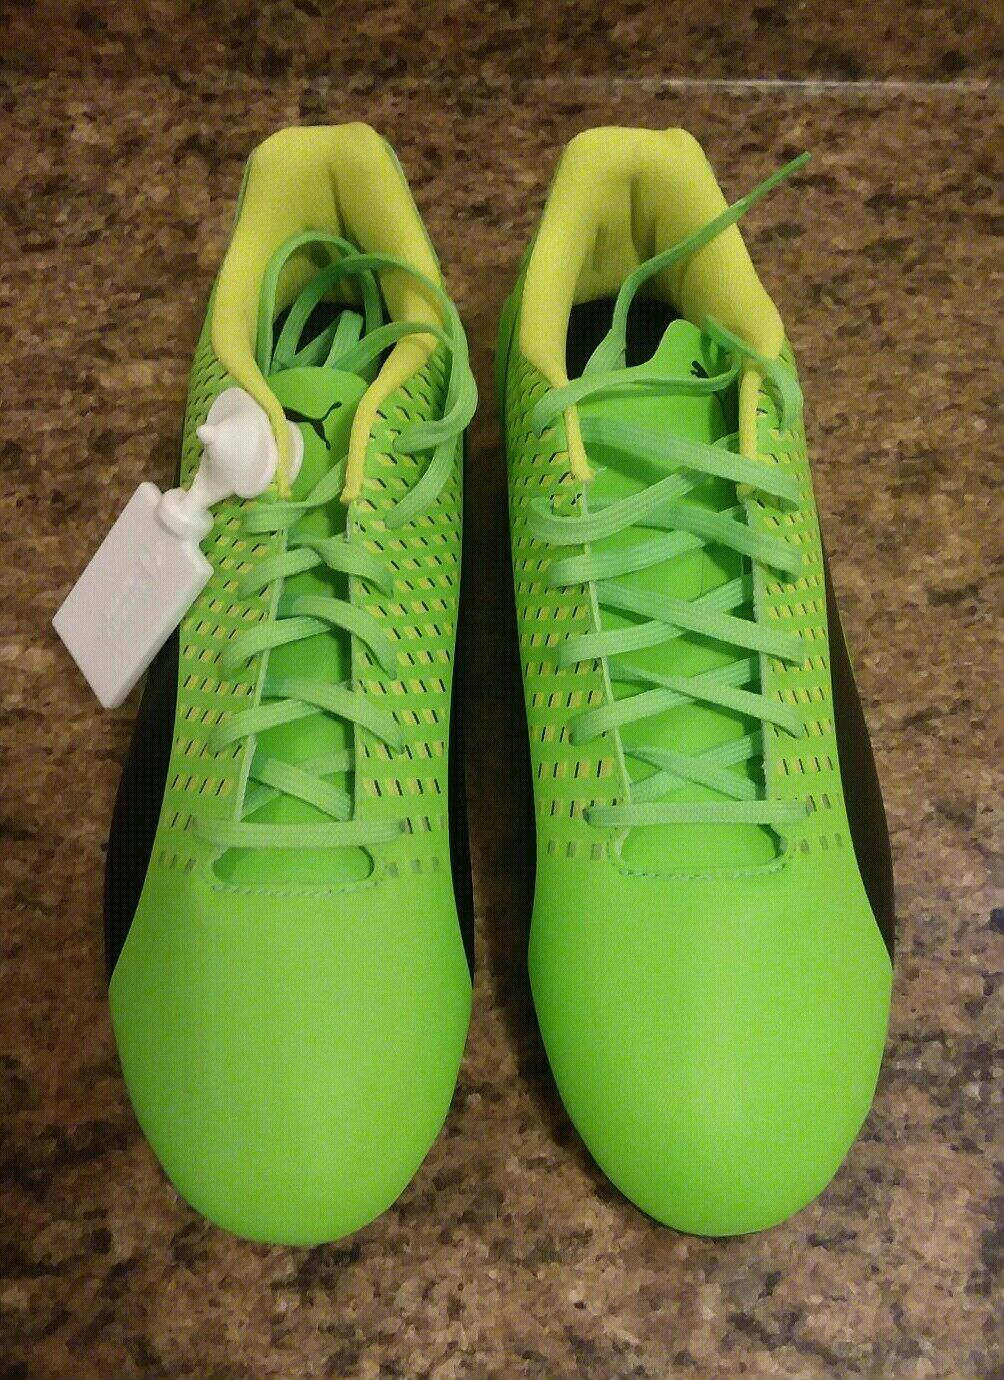 PUMA 10404601 Mens Adreno III FG Soccer shoes Size 12